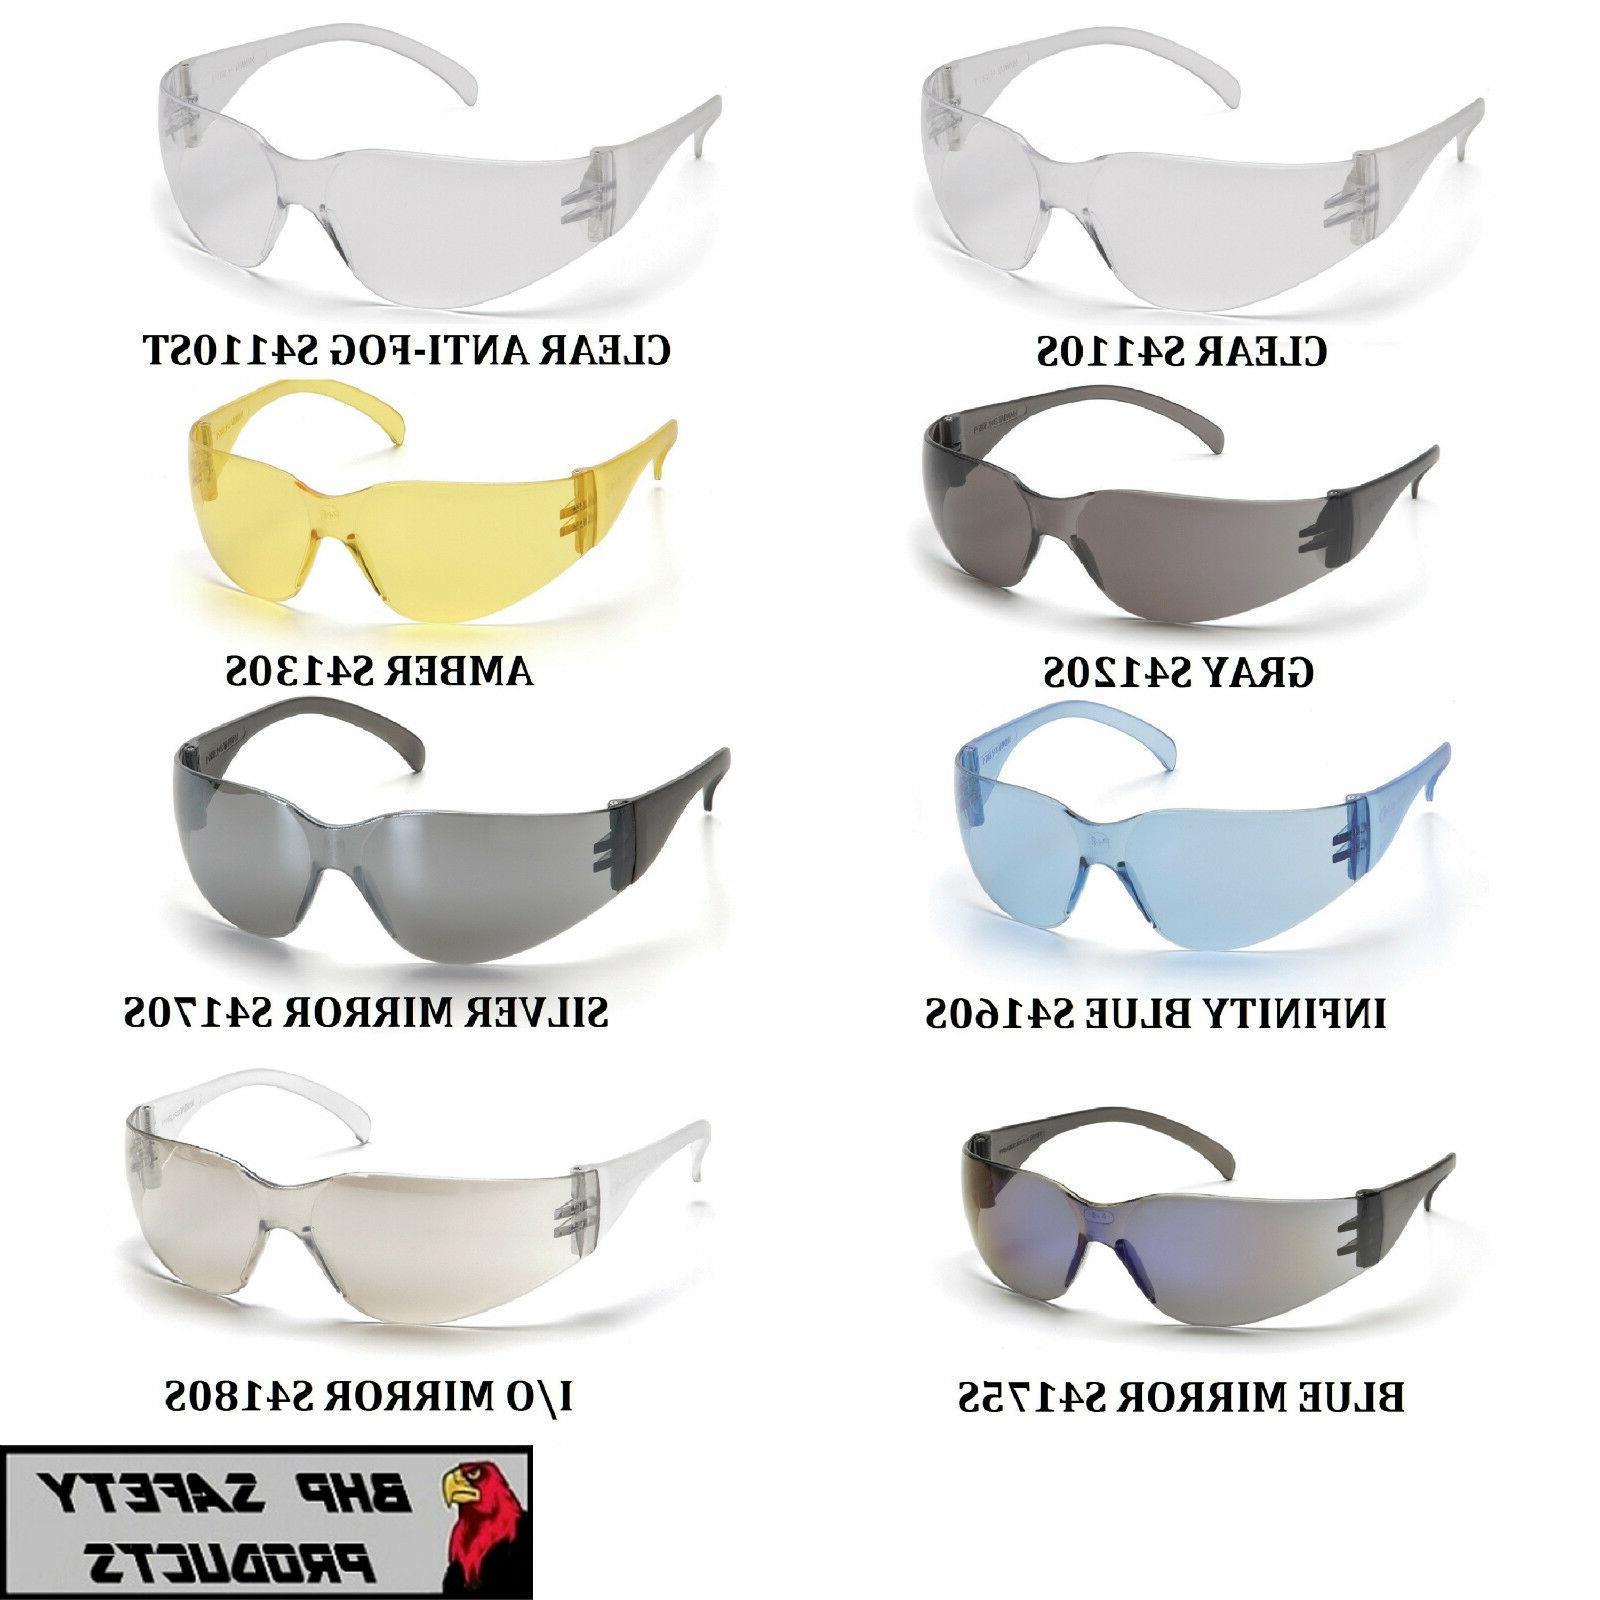 intruder safety glasses ansi z87 work eyewear